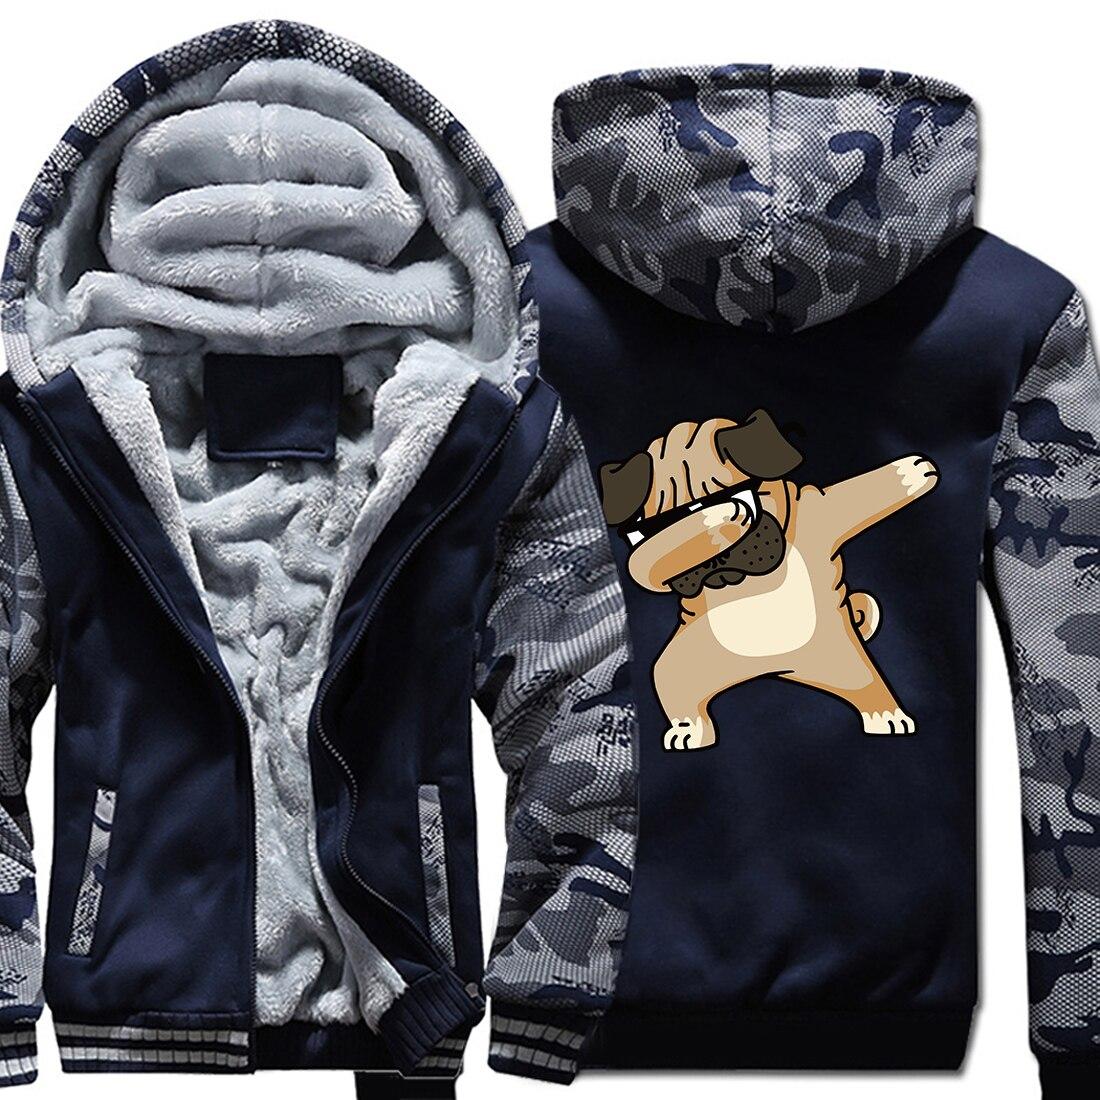 Hip hop sportswear tracksuits 2019 winter Novelty Dabbing Pug hooded jackets Men casual wool liner keep warm sweatshirts hoodies in Hoodies amp Sweatshirts from Men 39 s Clothing